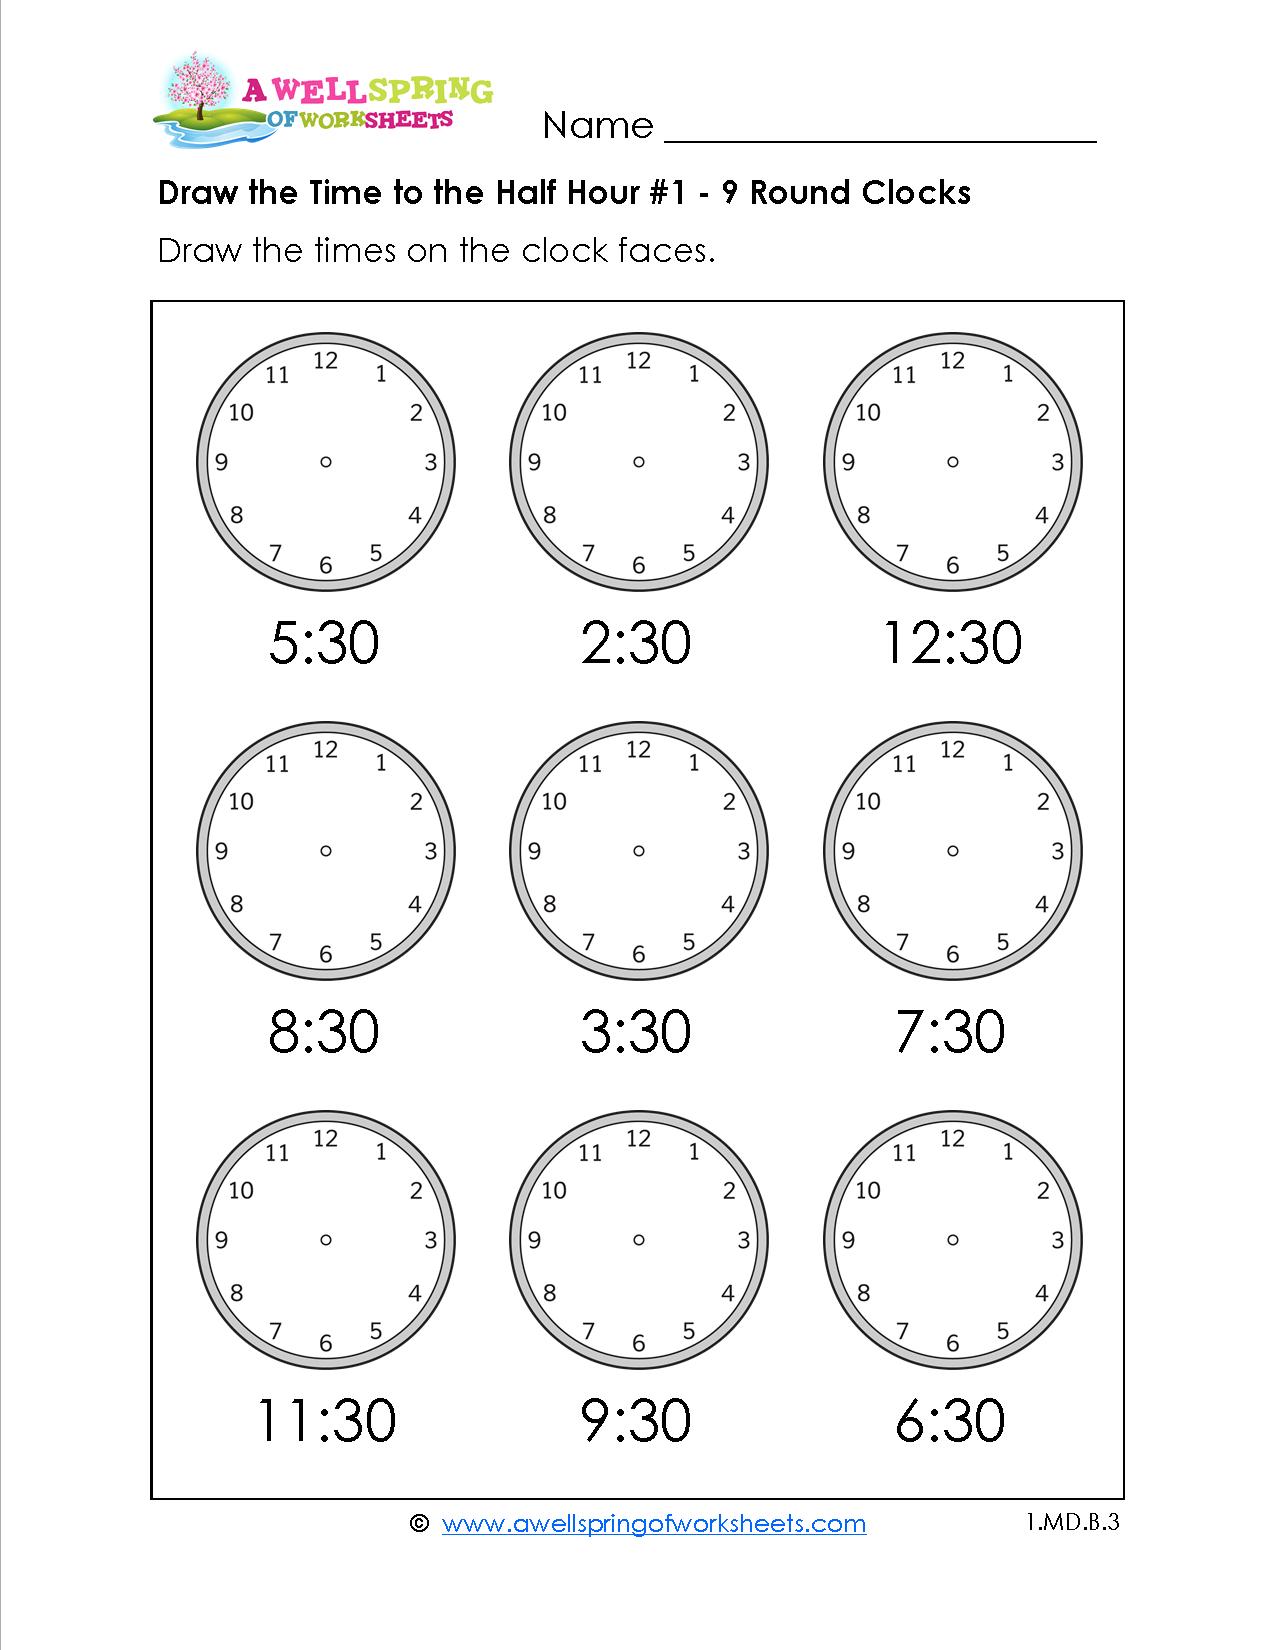 Grade Level Worksheets | Maths | 2Nd Grade Math Worksheets, First - Free Printable Telling Time Worksheets For 1St Grade